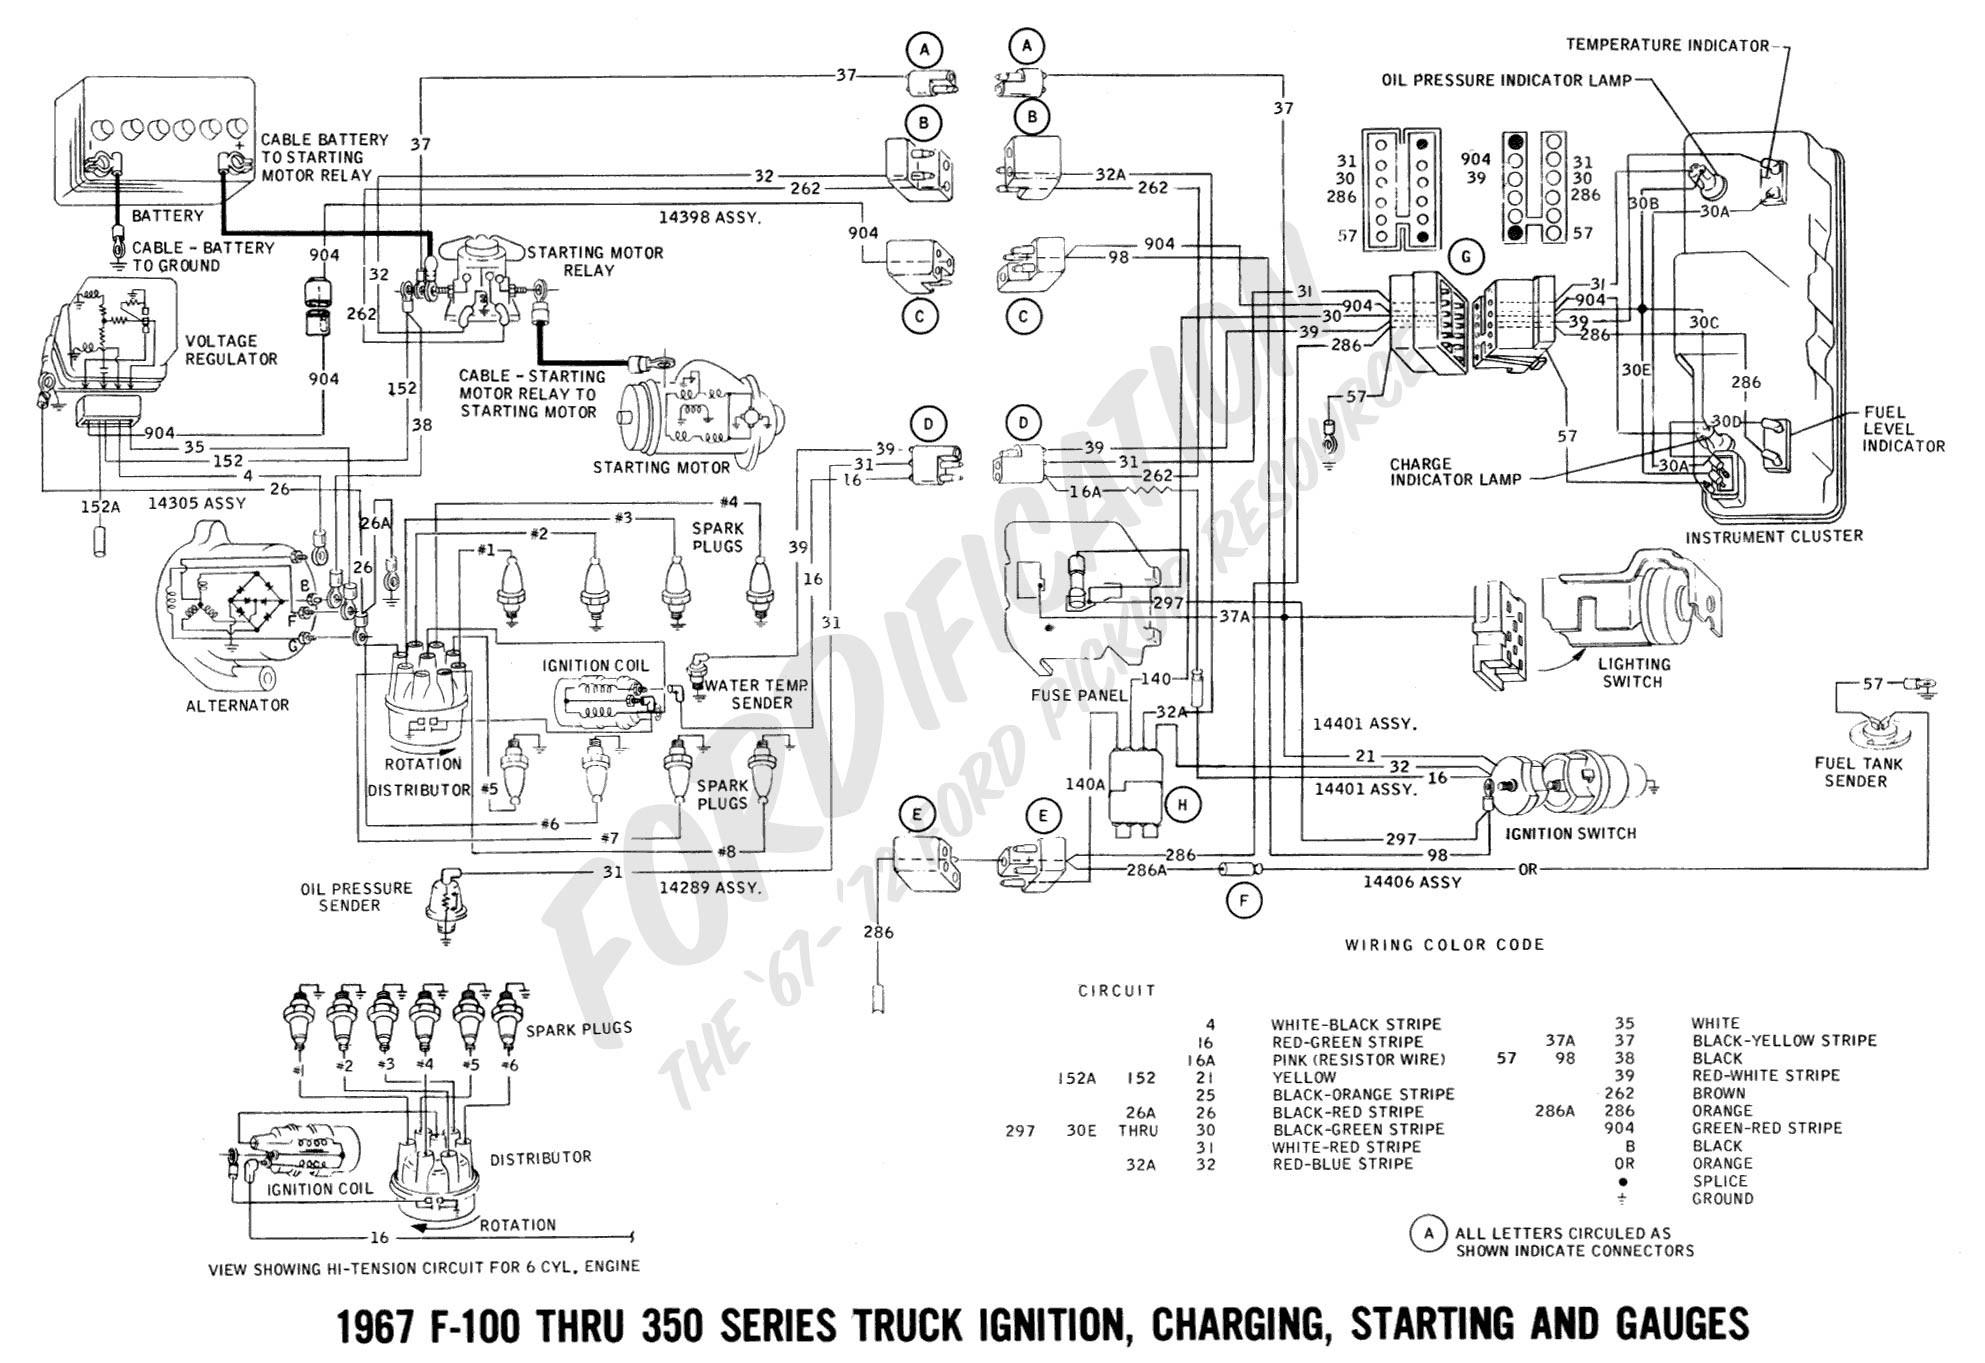 1969 ford pickup fuse box wiring diagram 1968 f100 fuse box wiring diagram